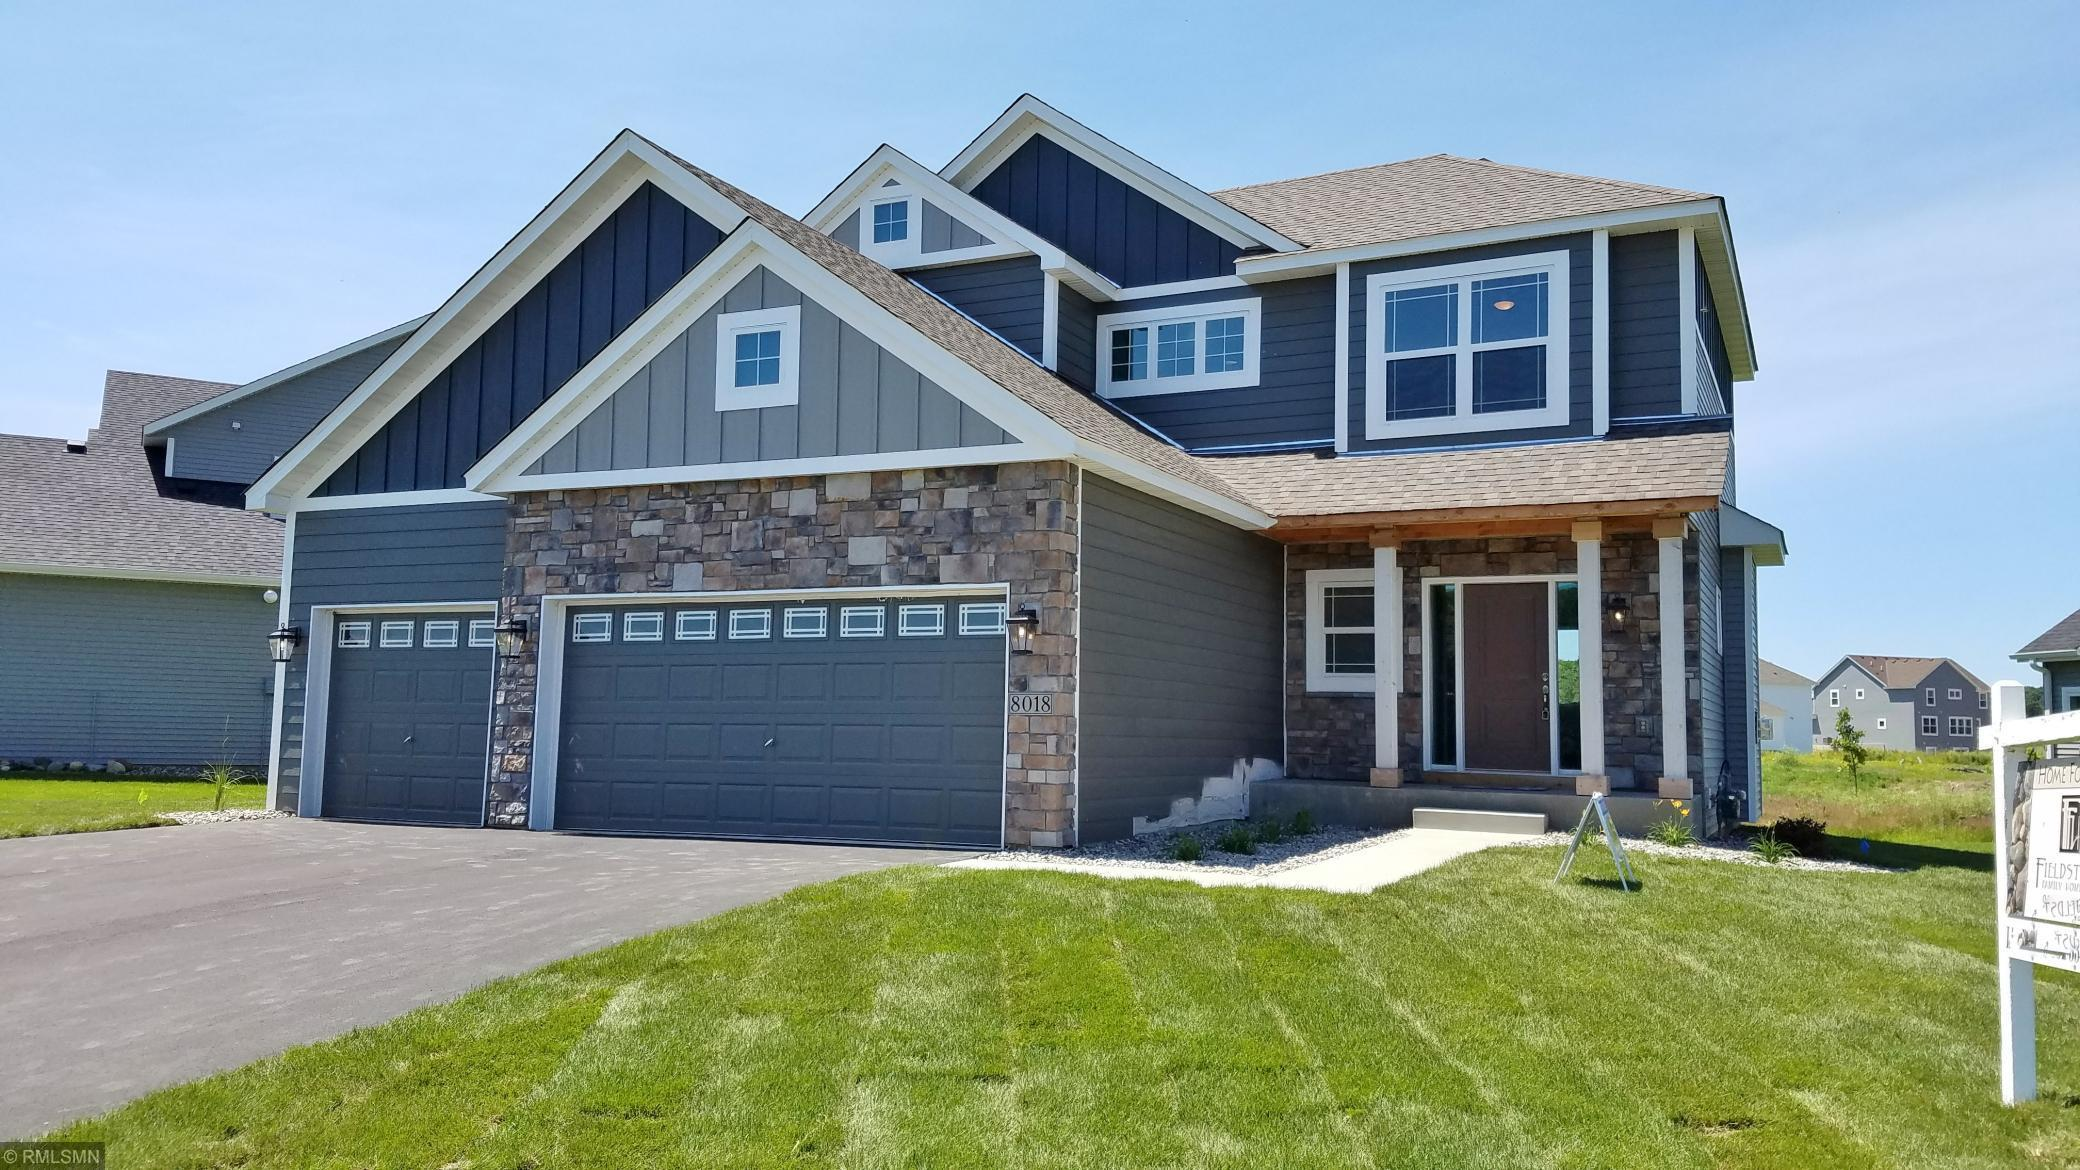 XXX01 438 Avenue Property Photo - Prescott, WI real estate listing